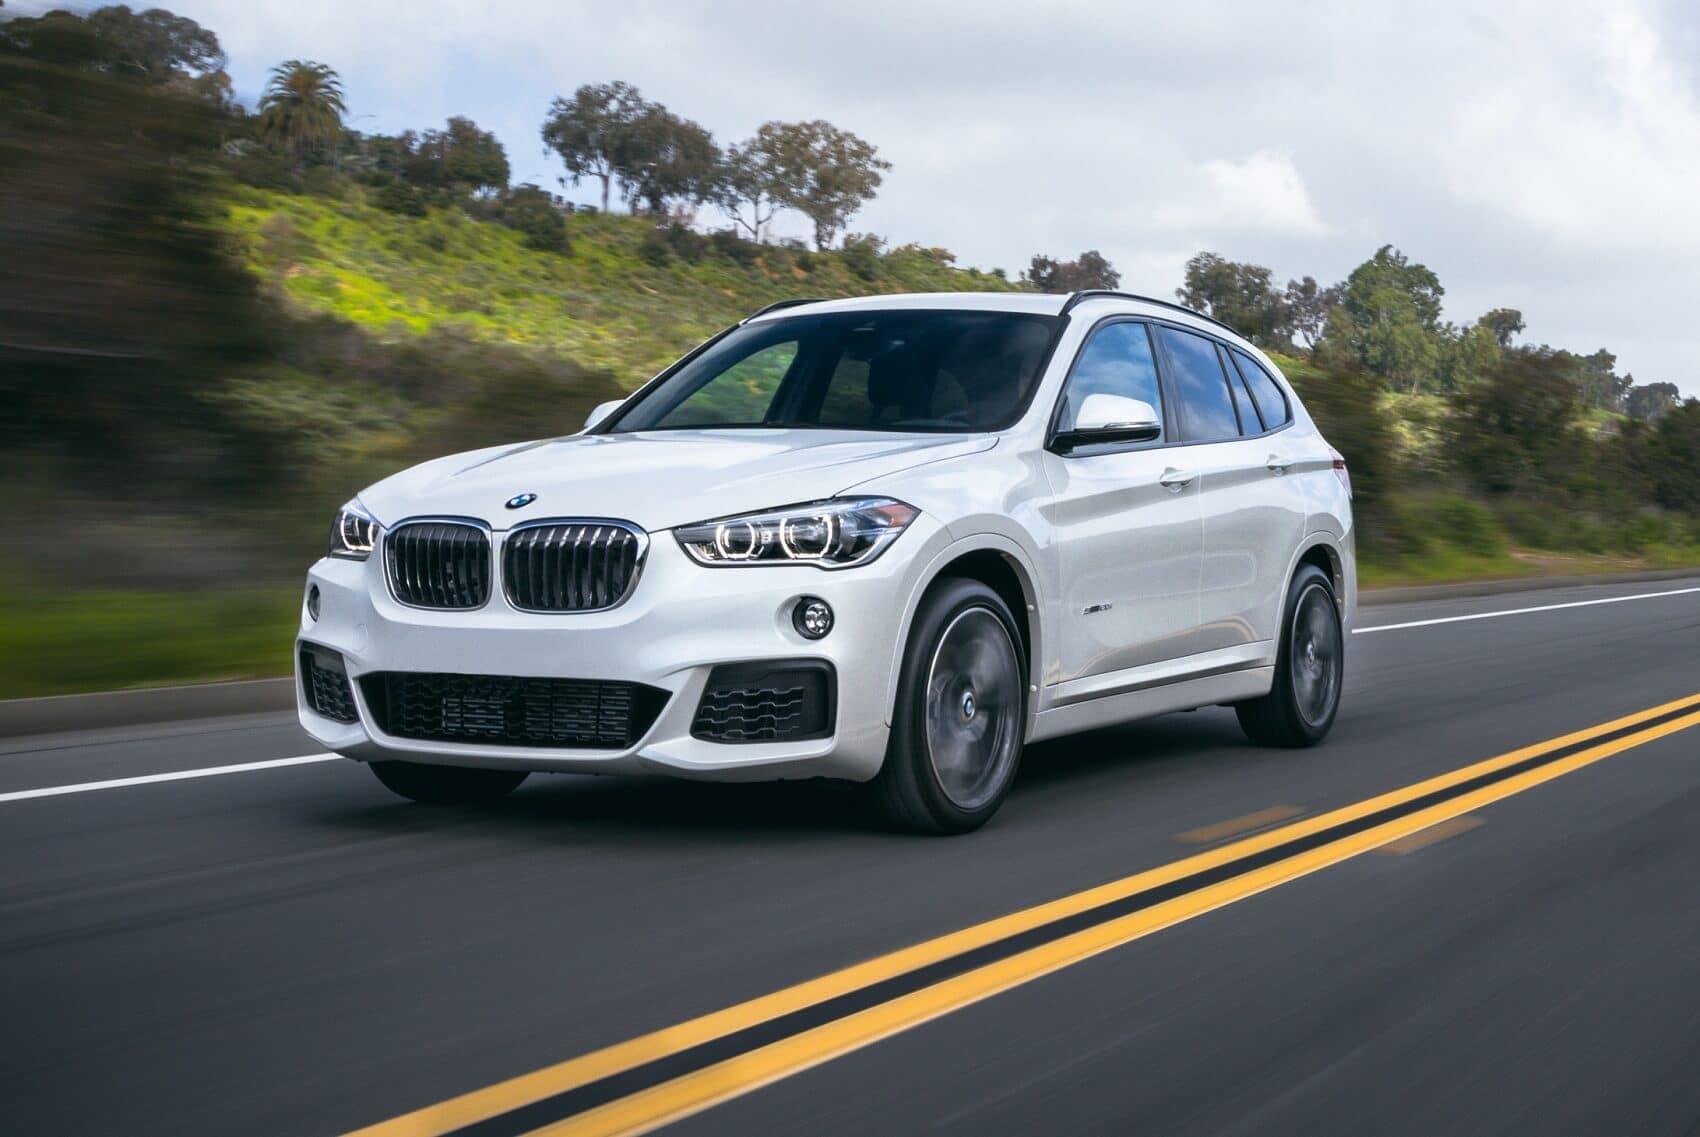 BMW X1 Driving